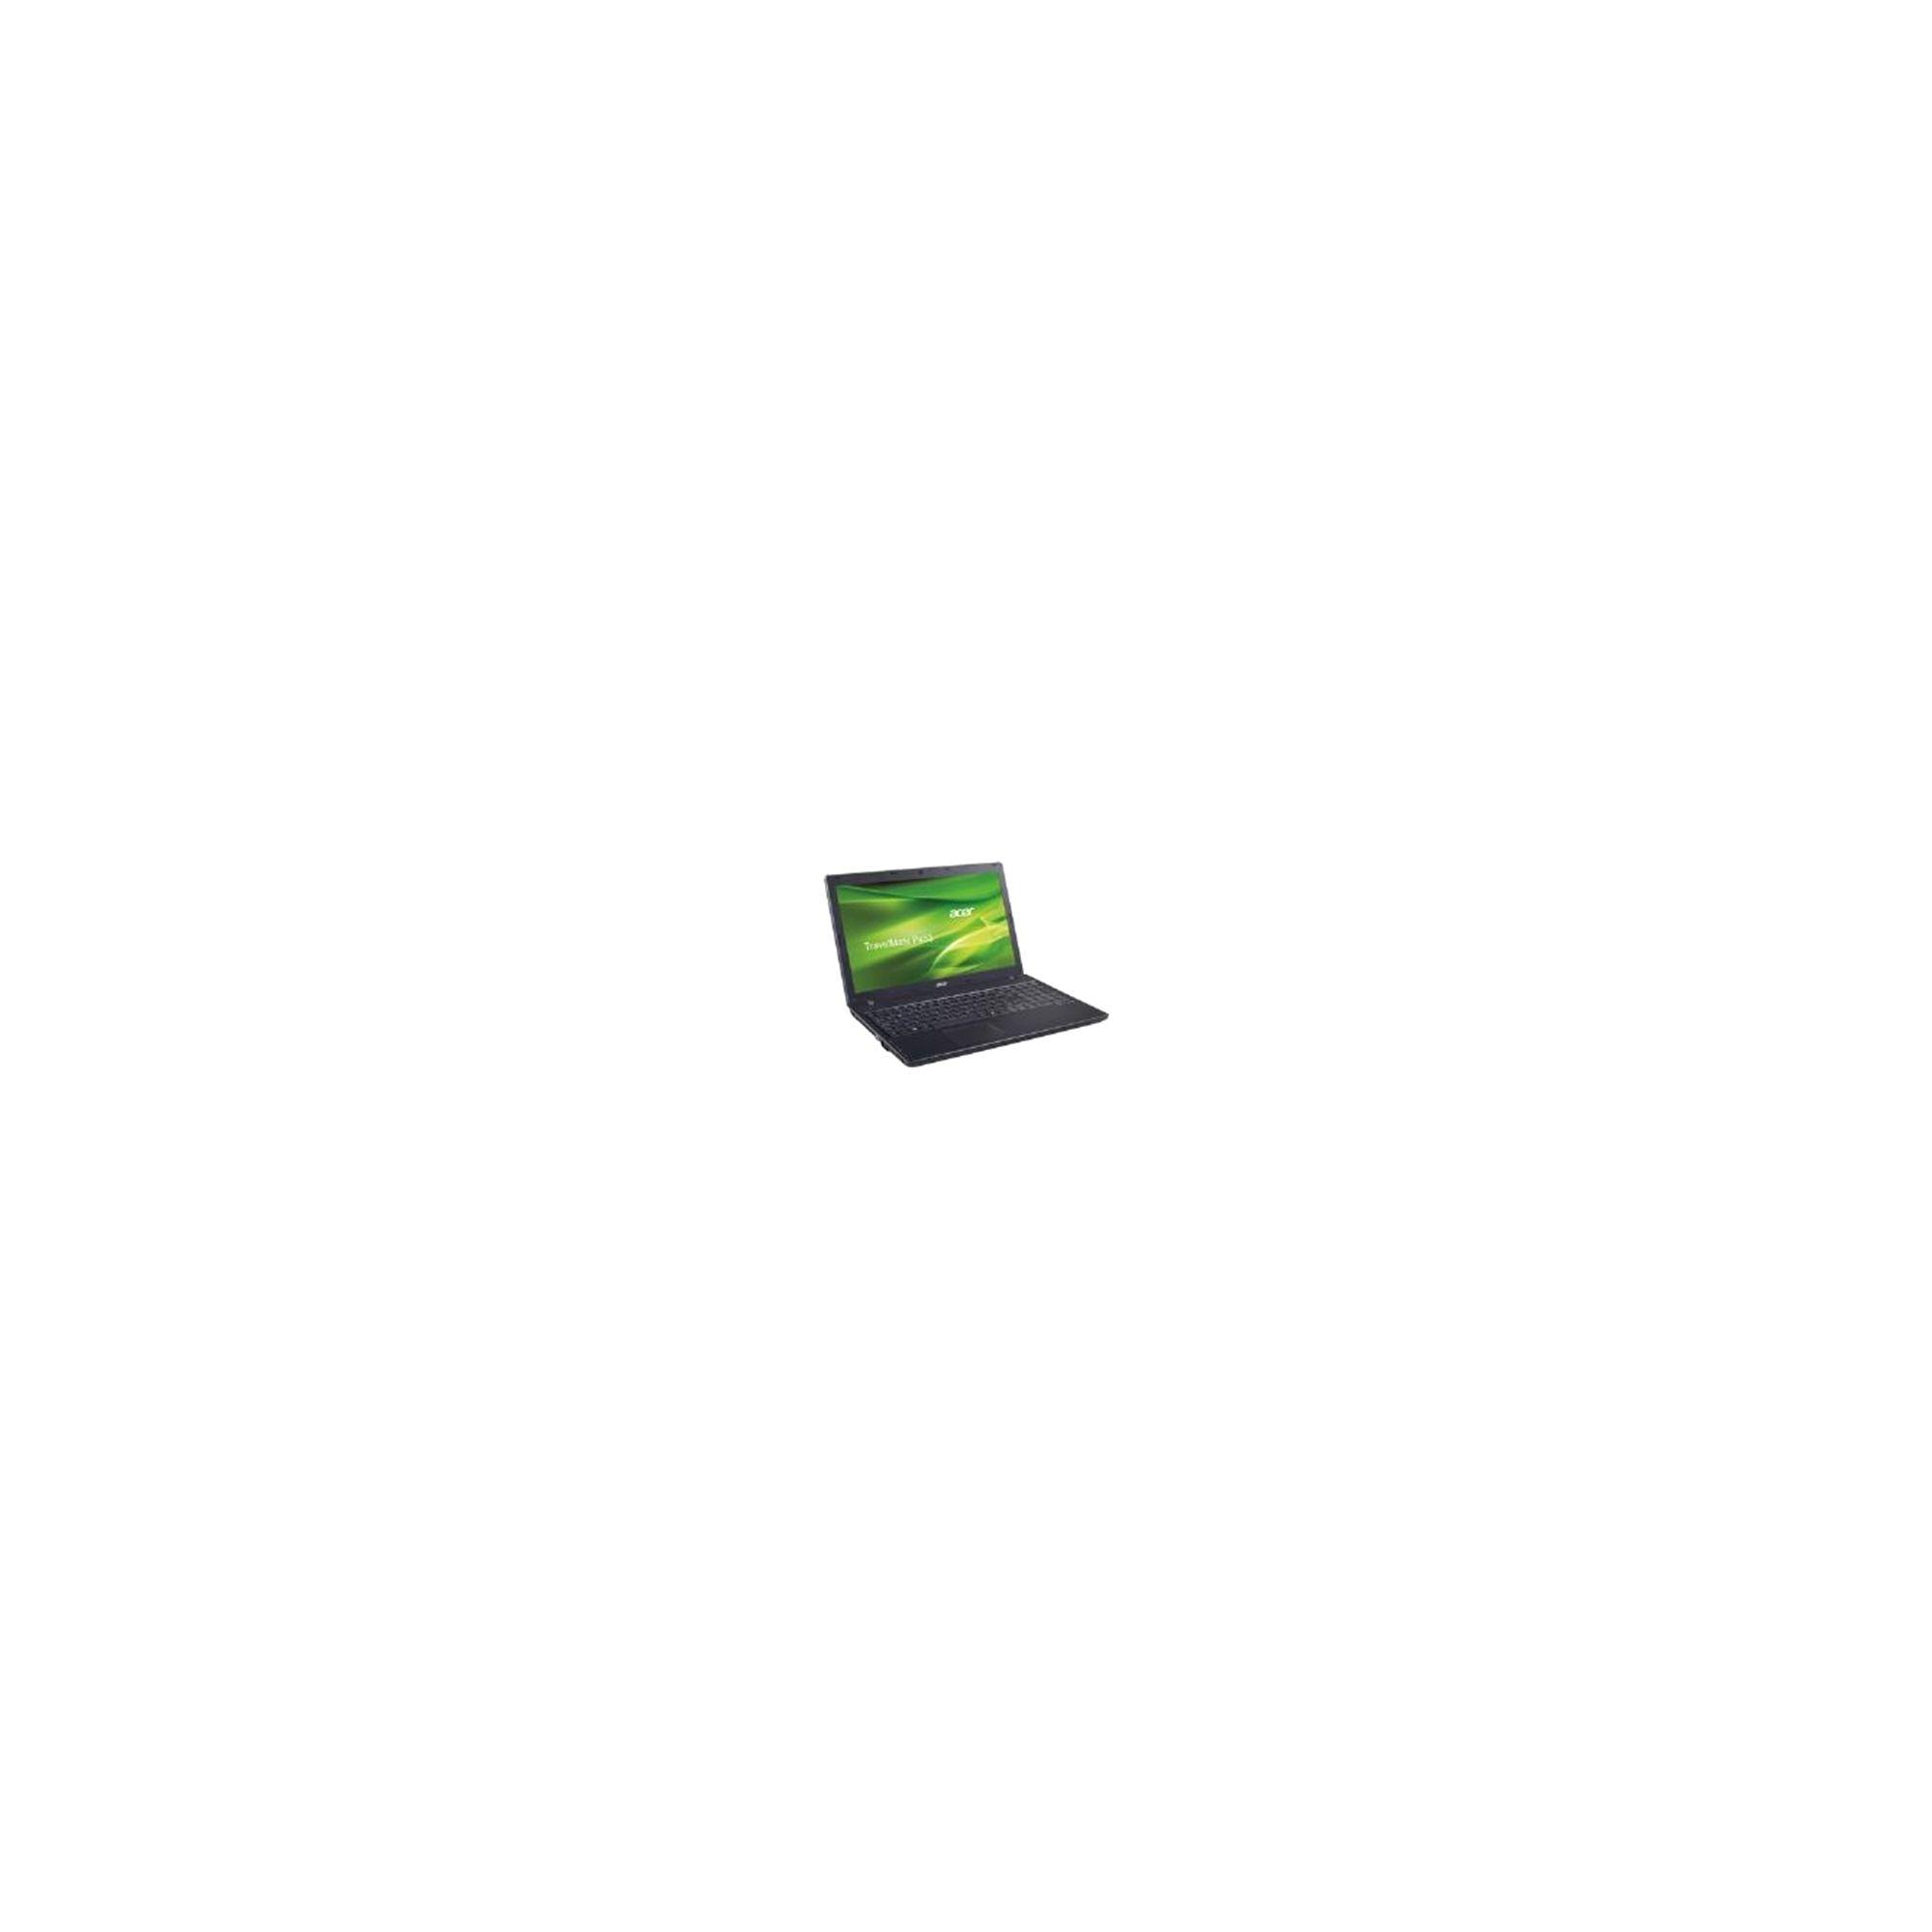 Acer TravelMate P453-M-33114G50Makk (15.6 inch) Notebook Core i3 (3110M) 2.4GHz 4GB 500GB WLAN BT Webcam Windows 7 Pro 64-bit/Windows 8 Pro 64-bit at Tescos Direct